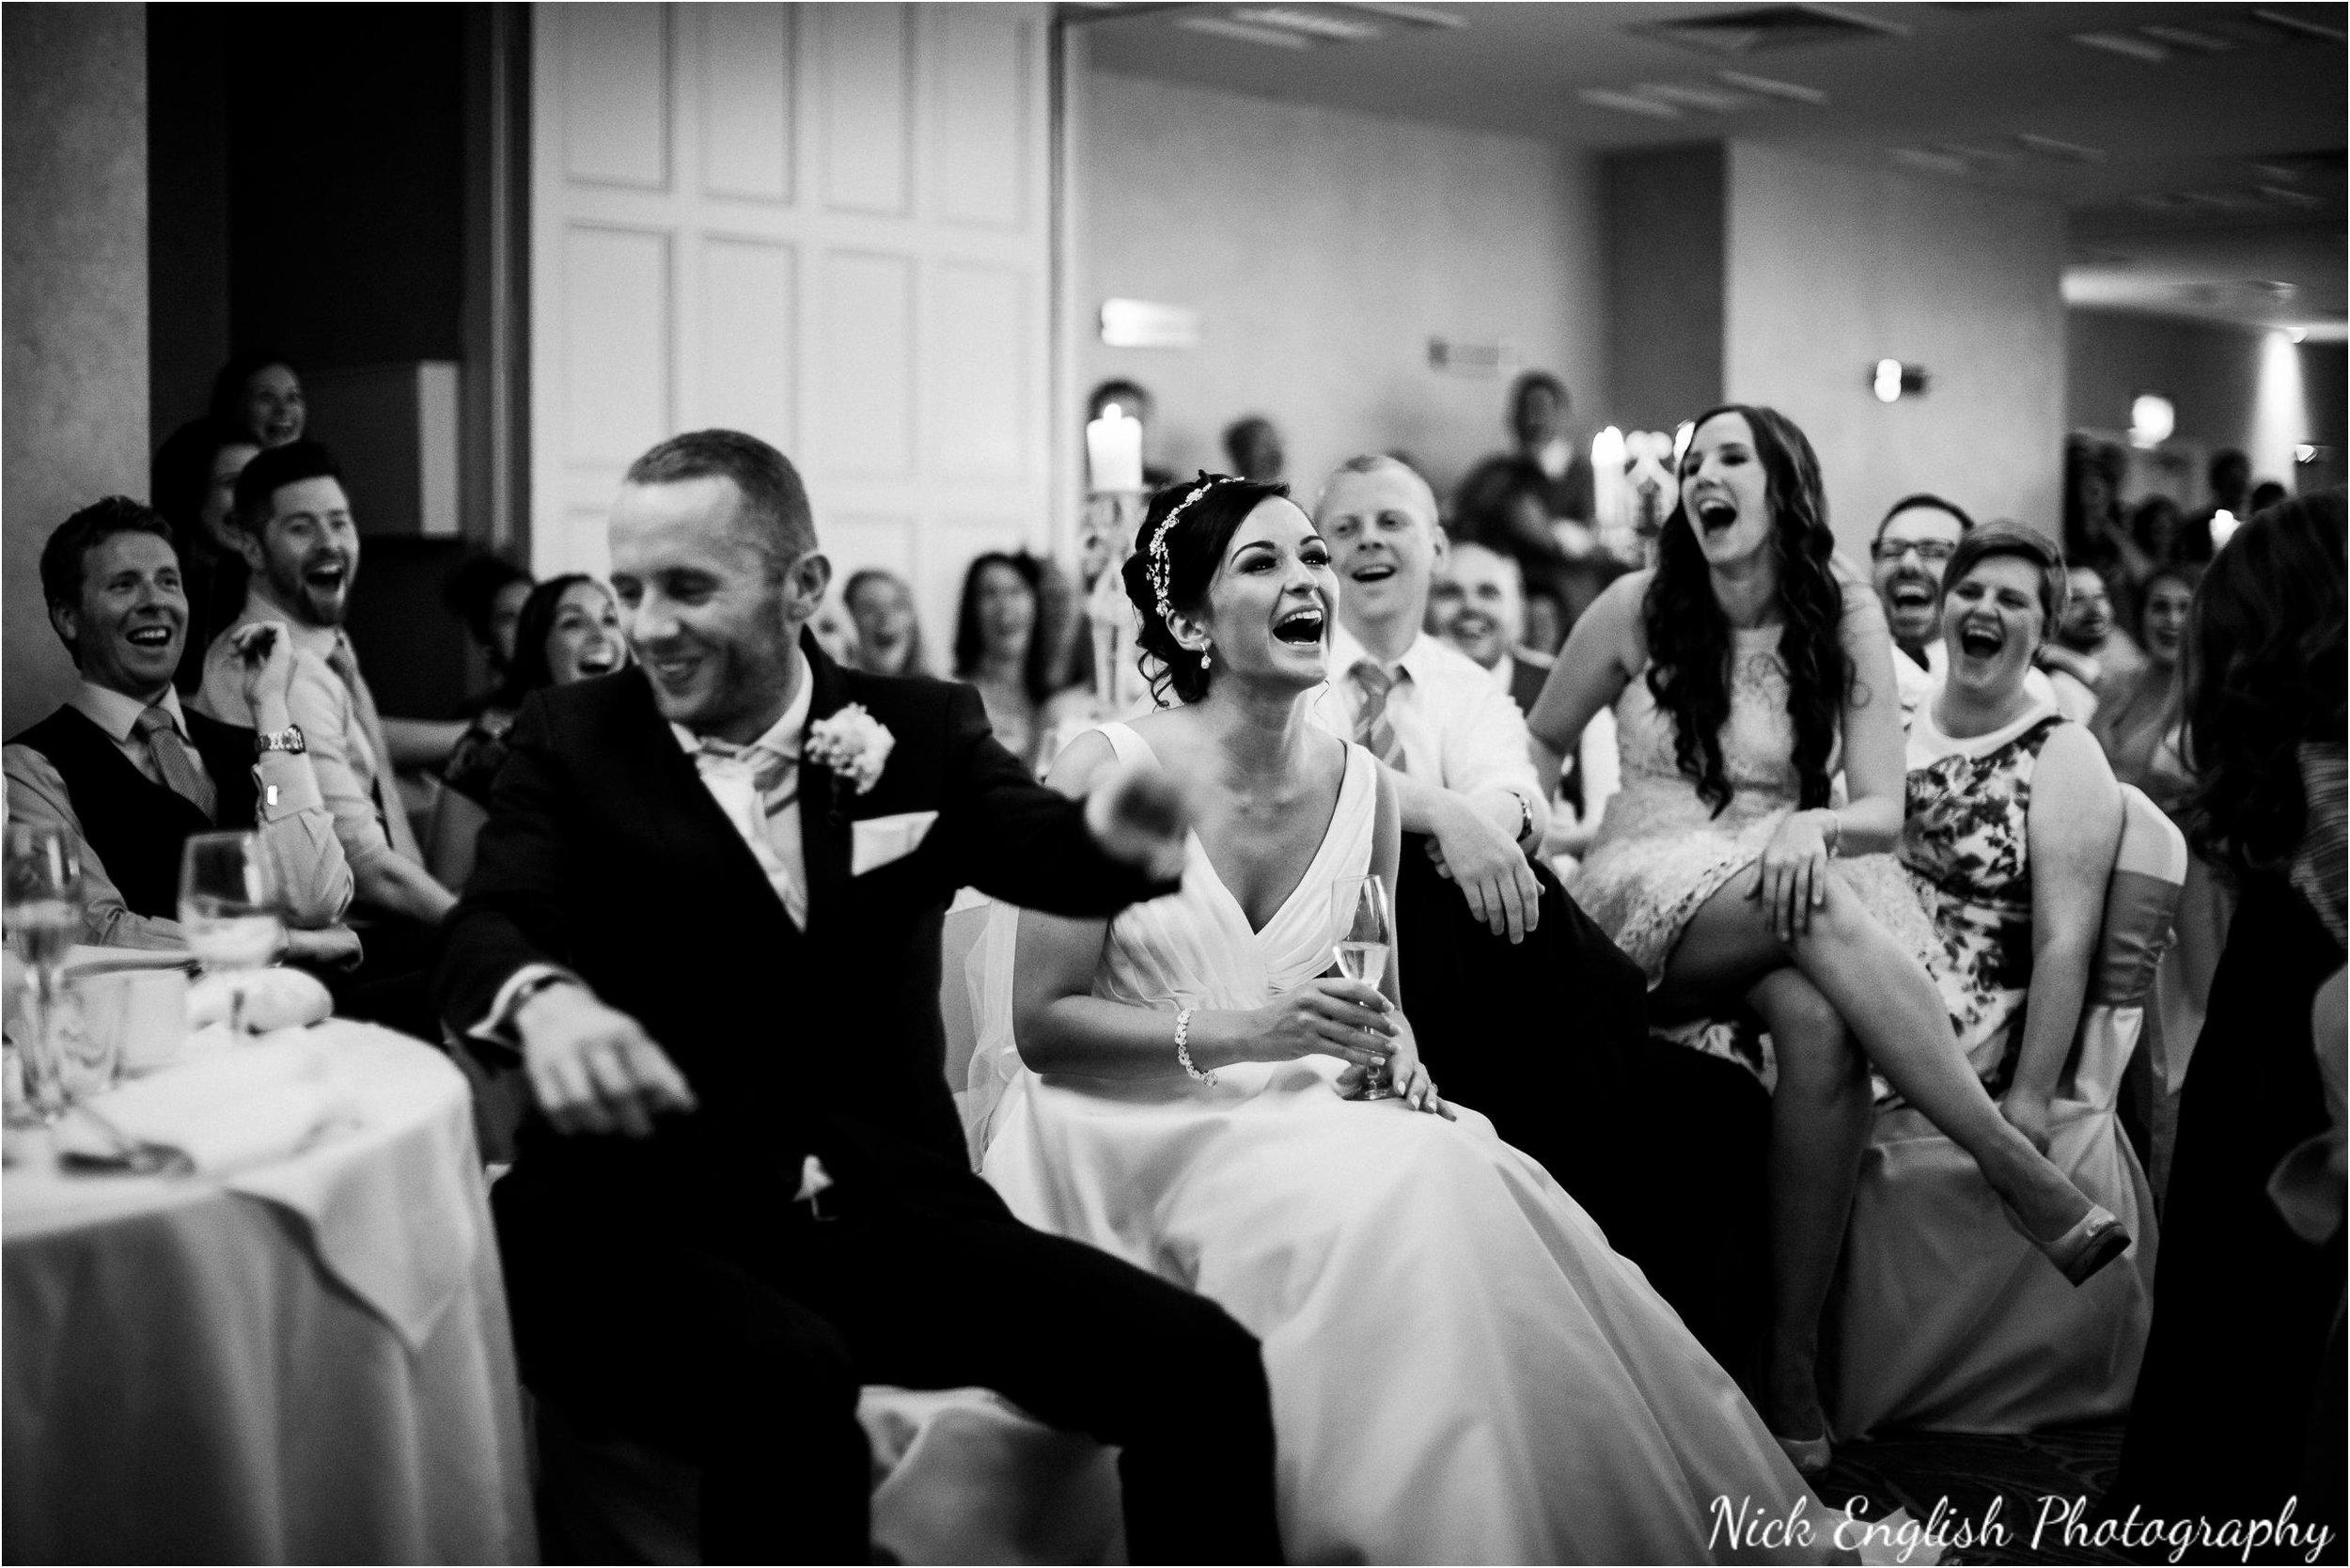 Emily David Wedding Photographs at Barton Grange Preston by Nick English Photography 192jpg.jpeg